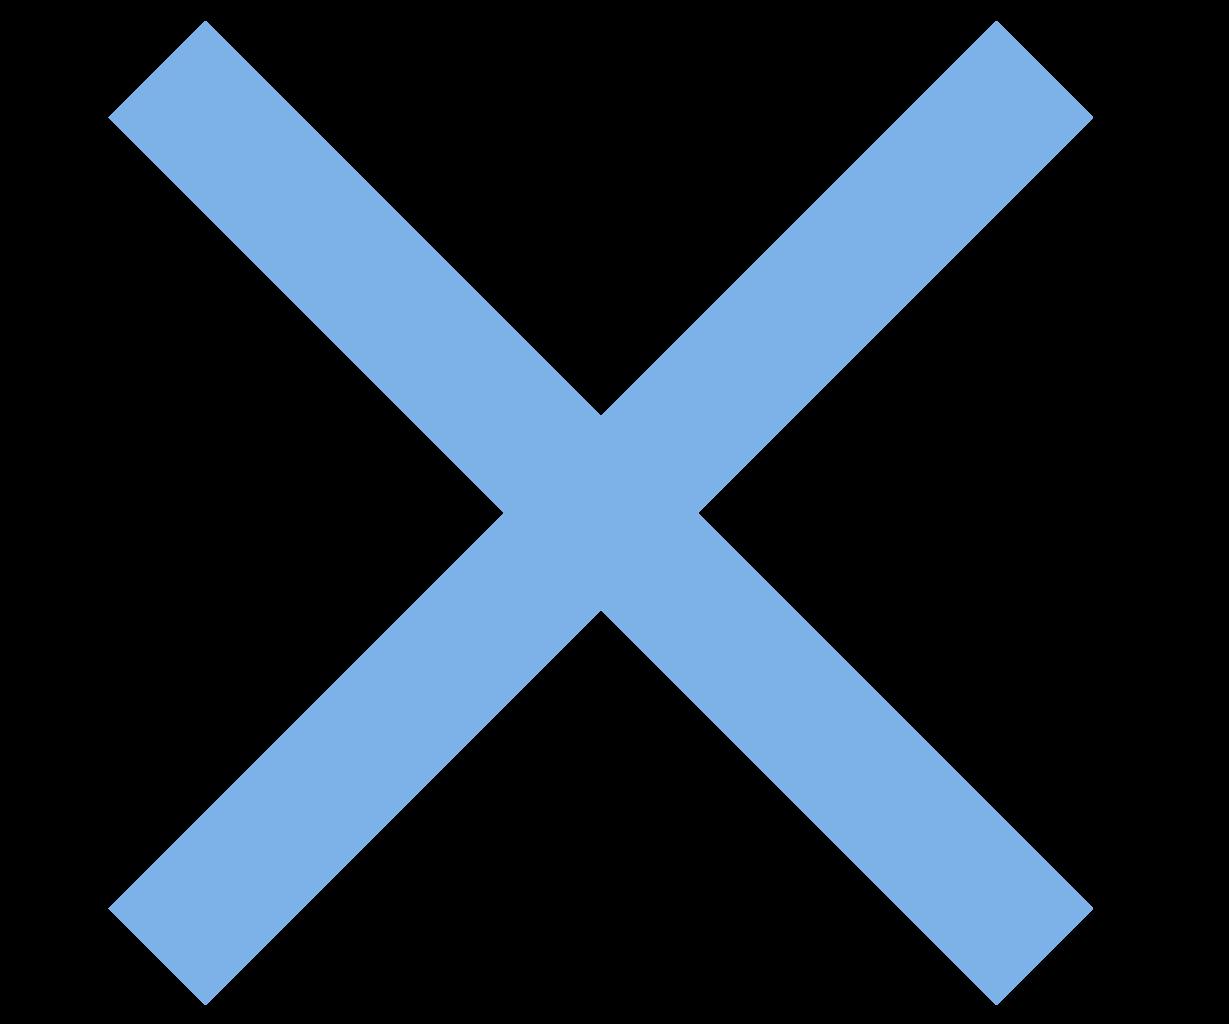 File:PlayStationX.svg.